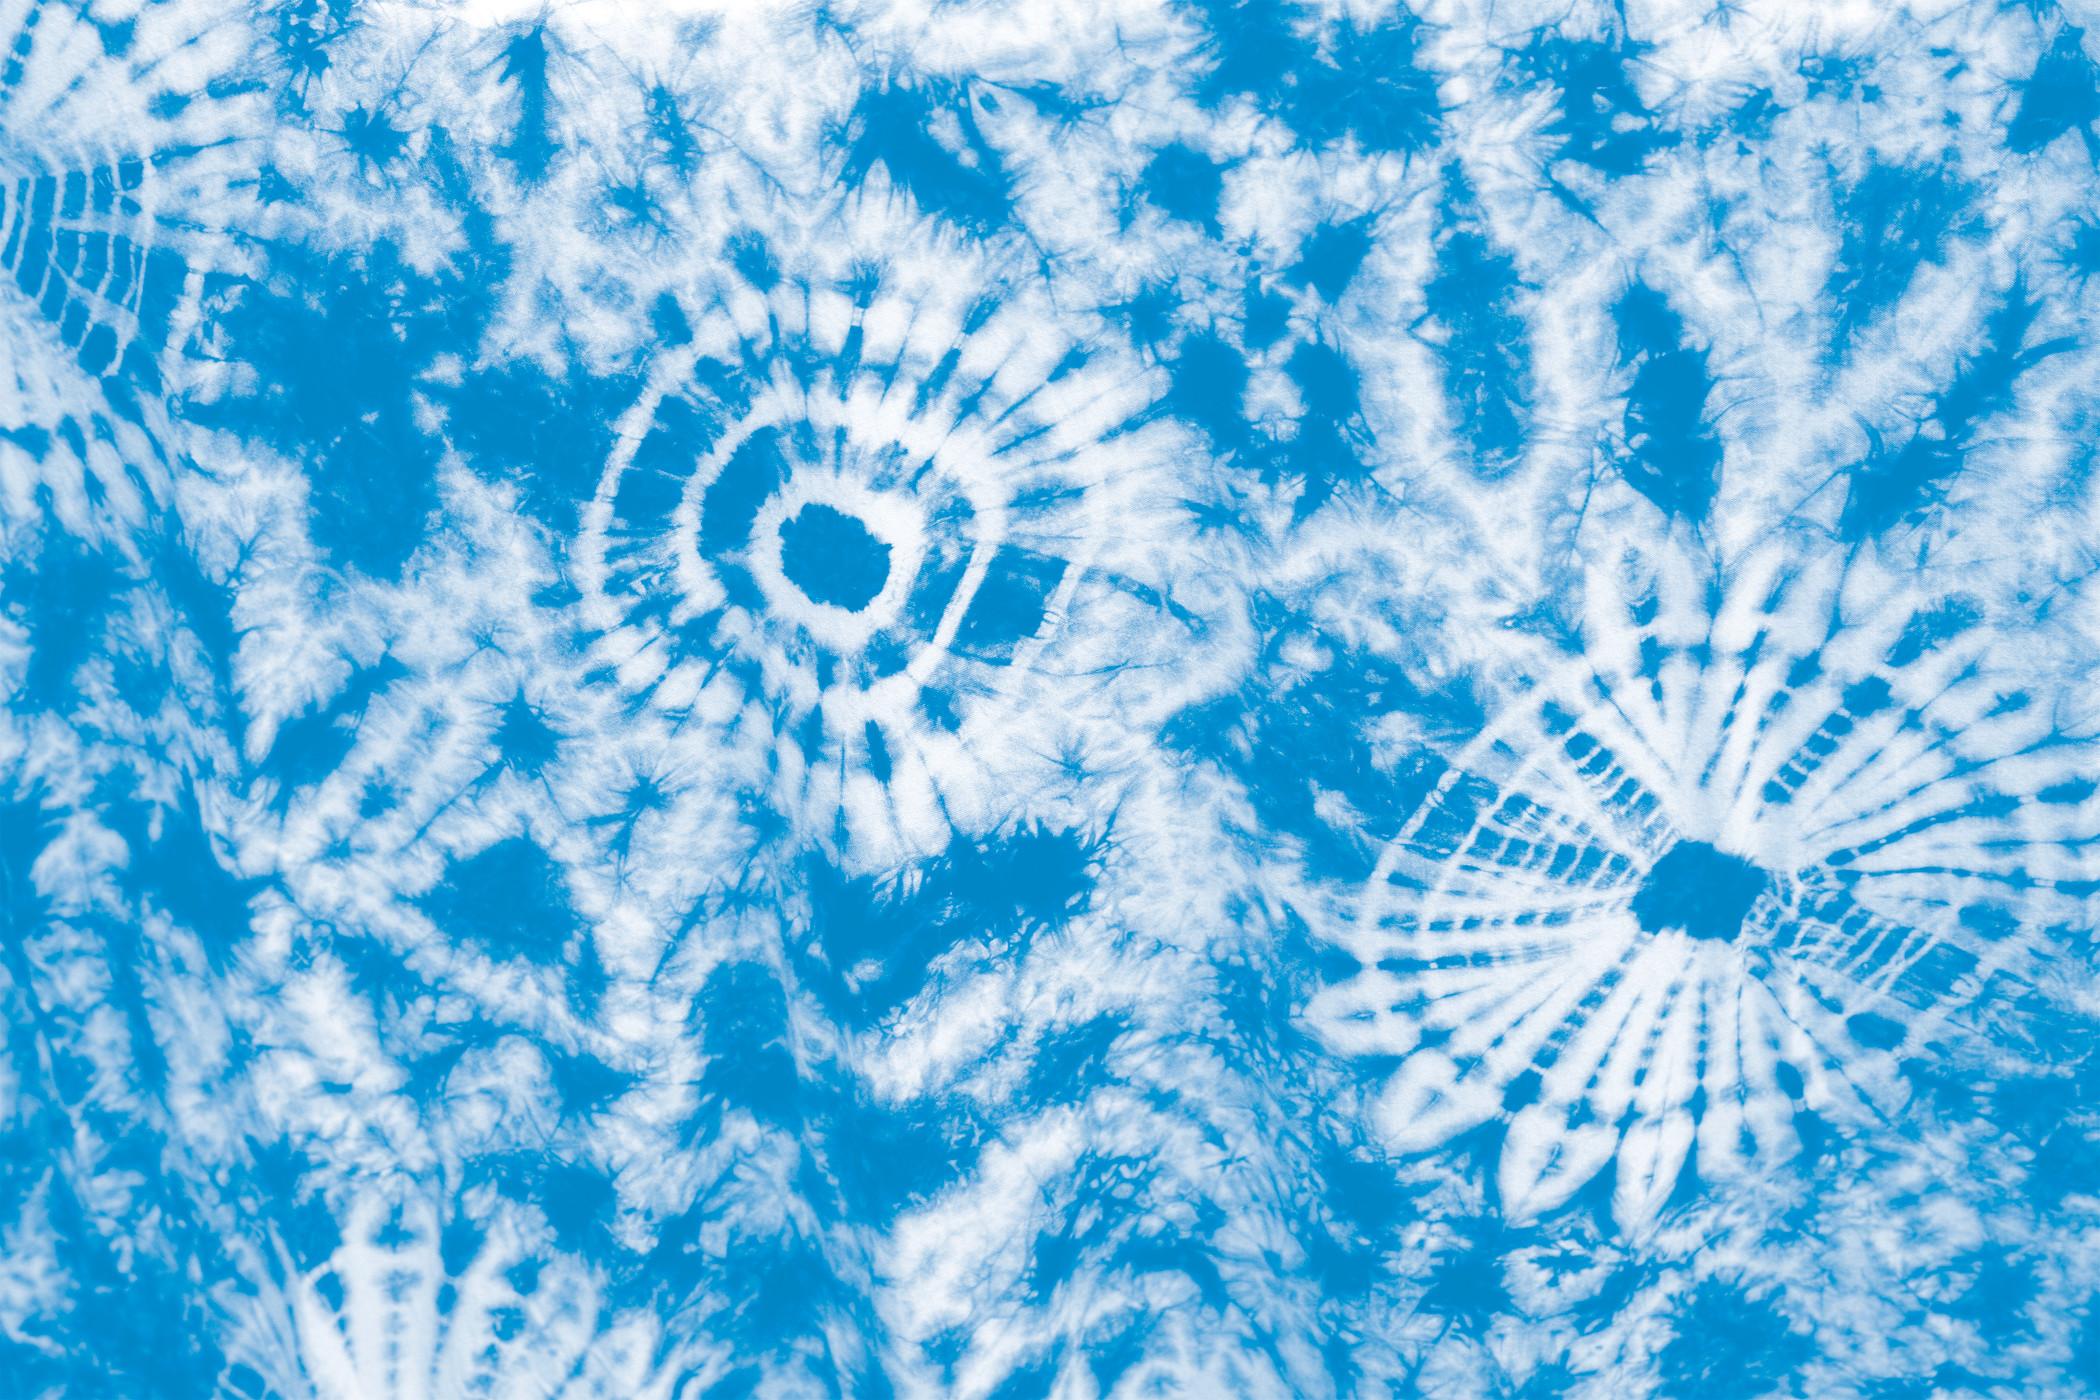 Tie Dye Wallpaper 52 images 2100x1400